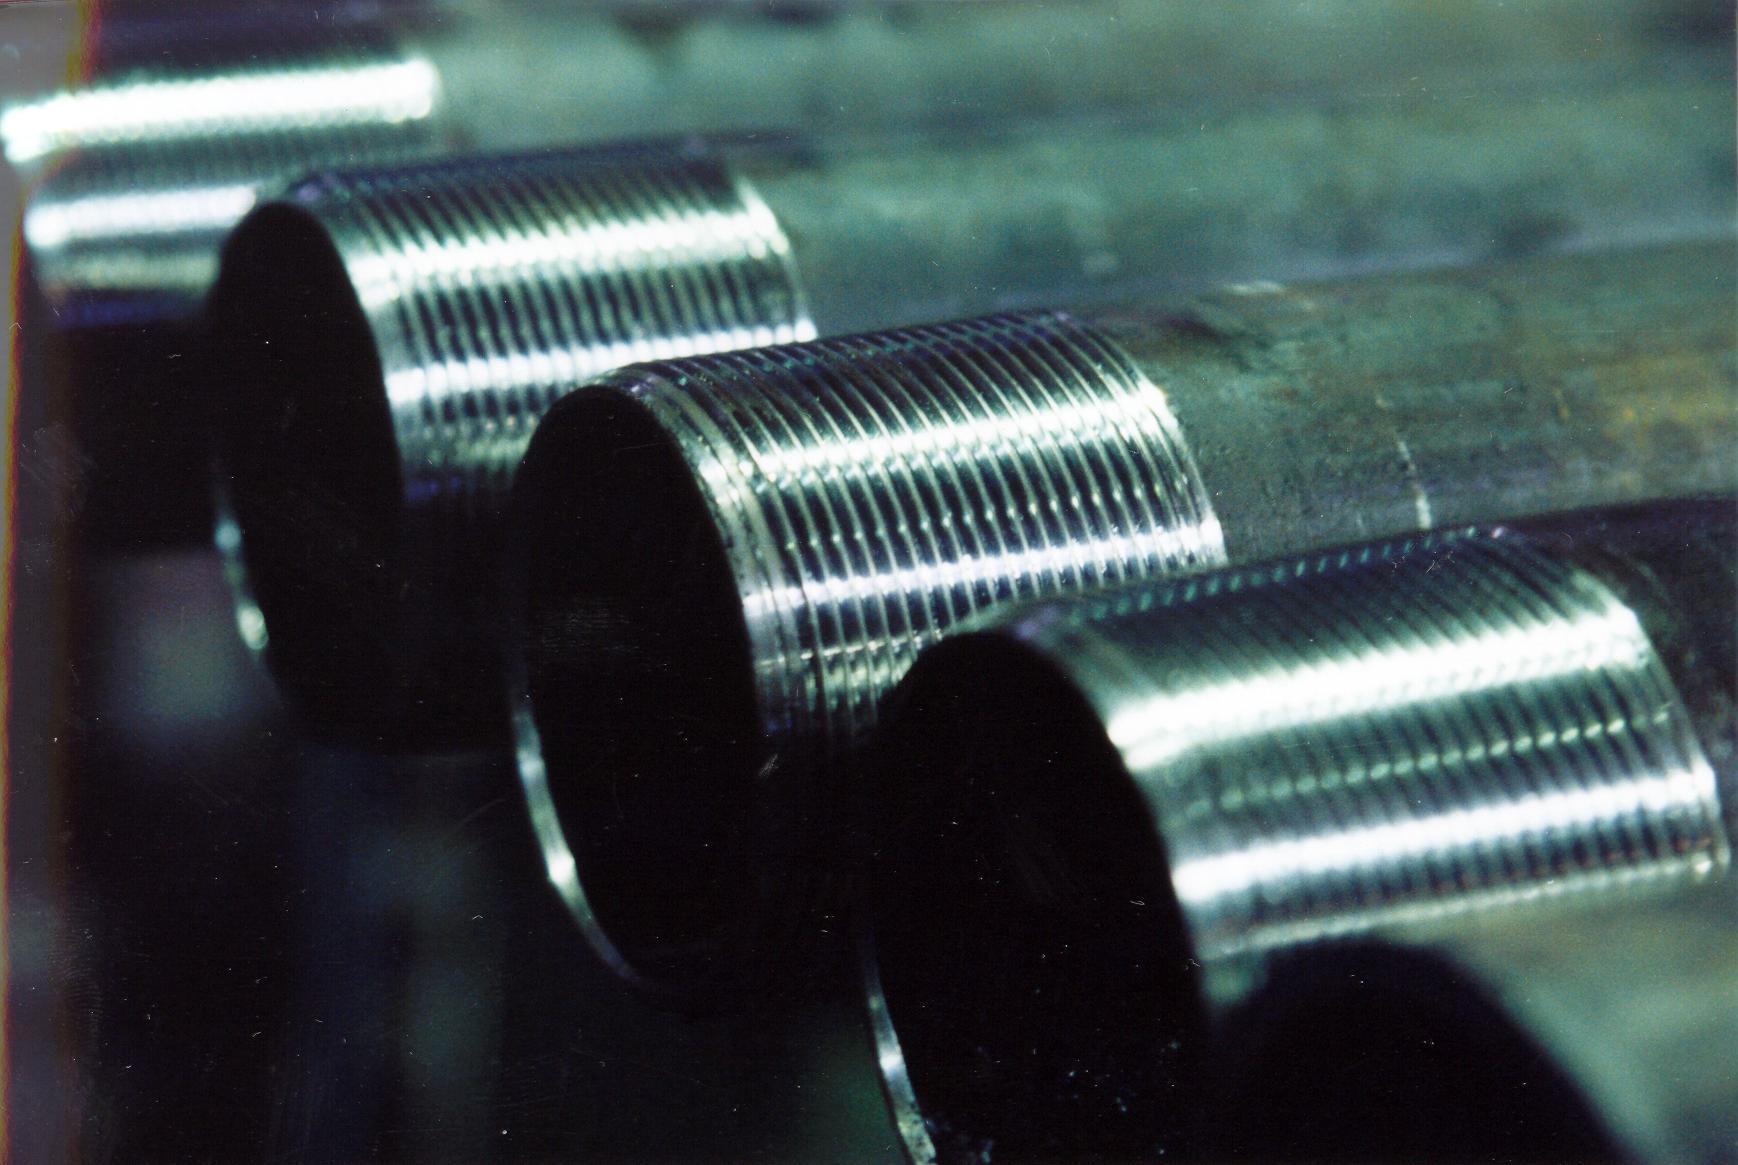 СинТЗ провел капремонт и модернизацию трубопрокатного агрегата